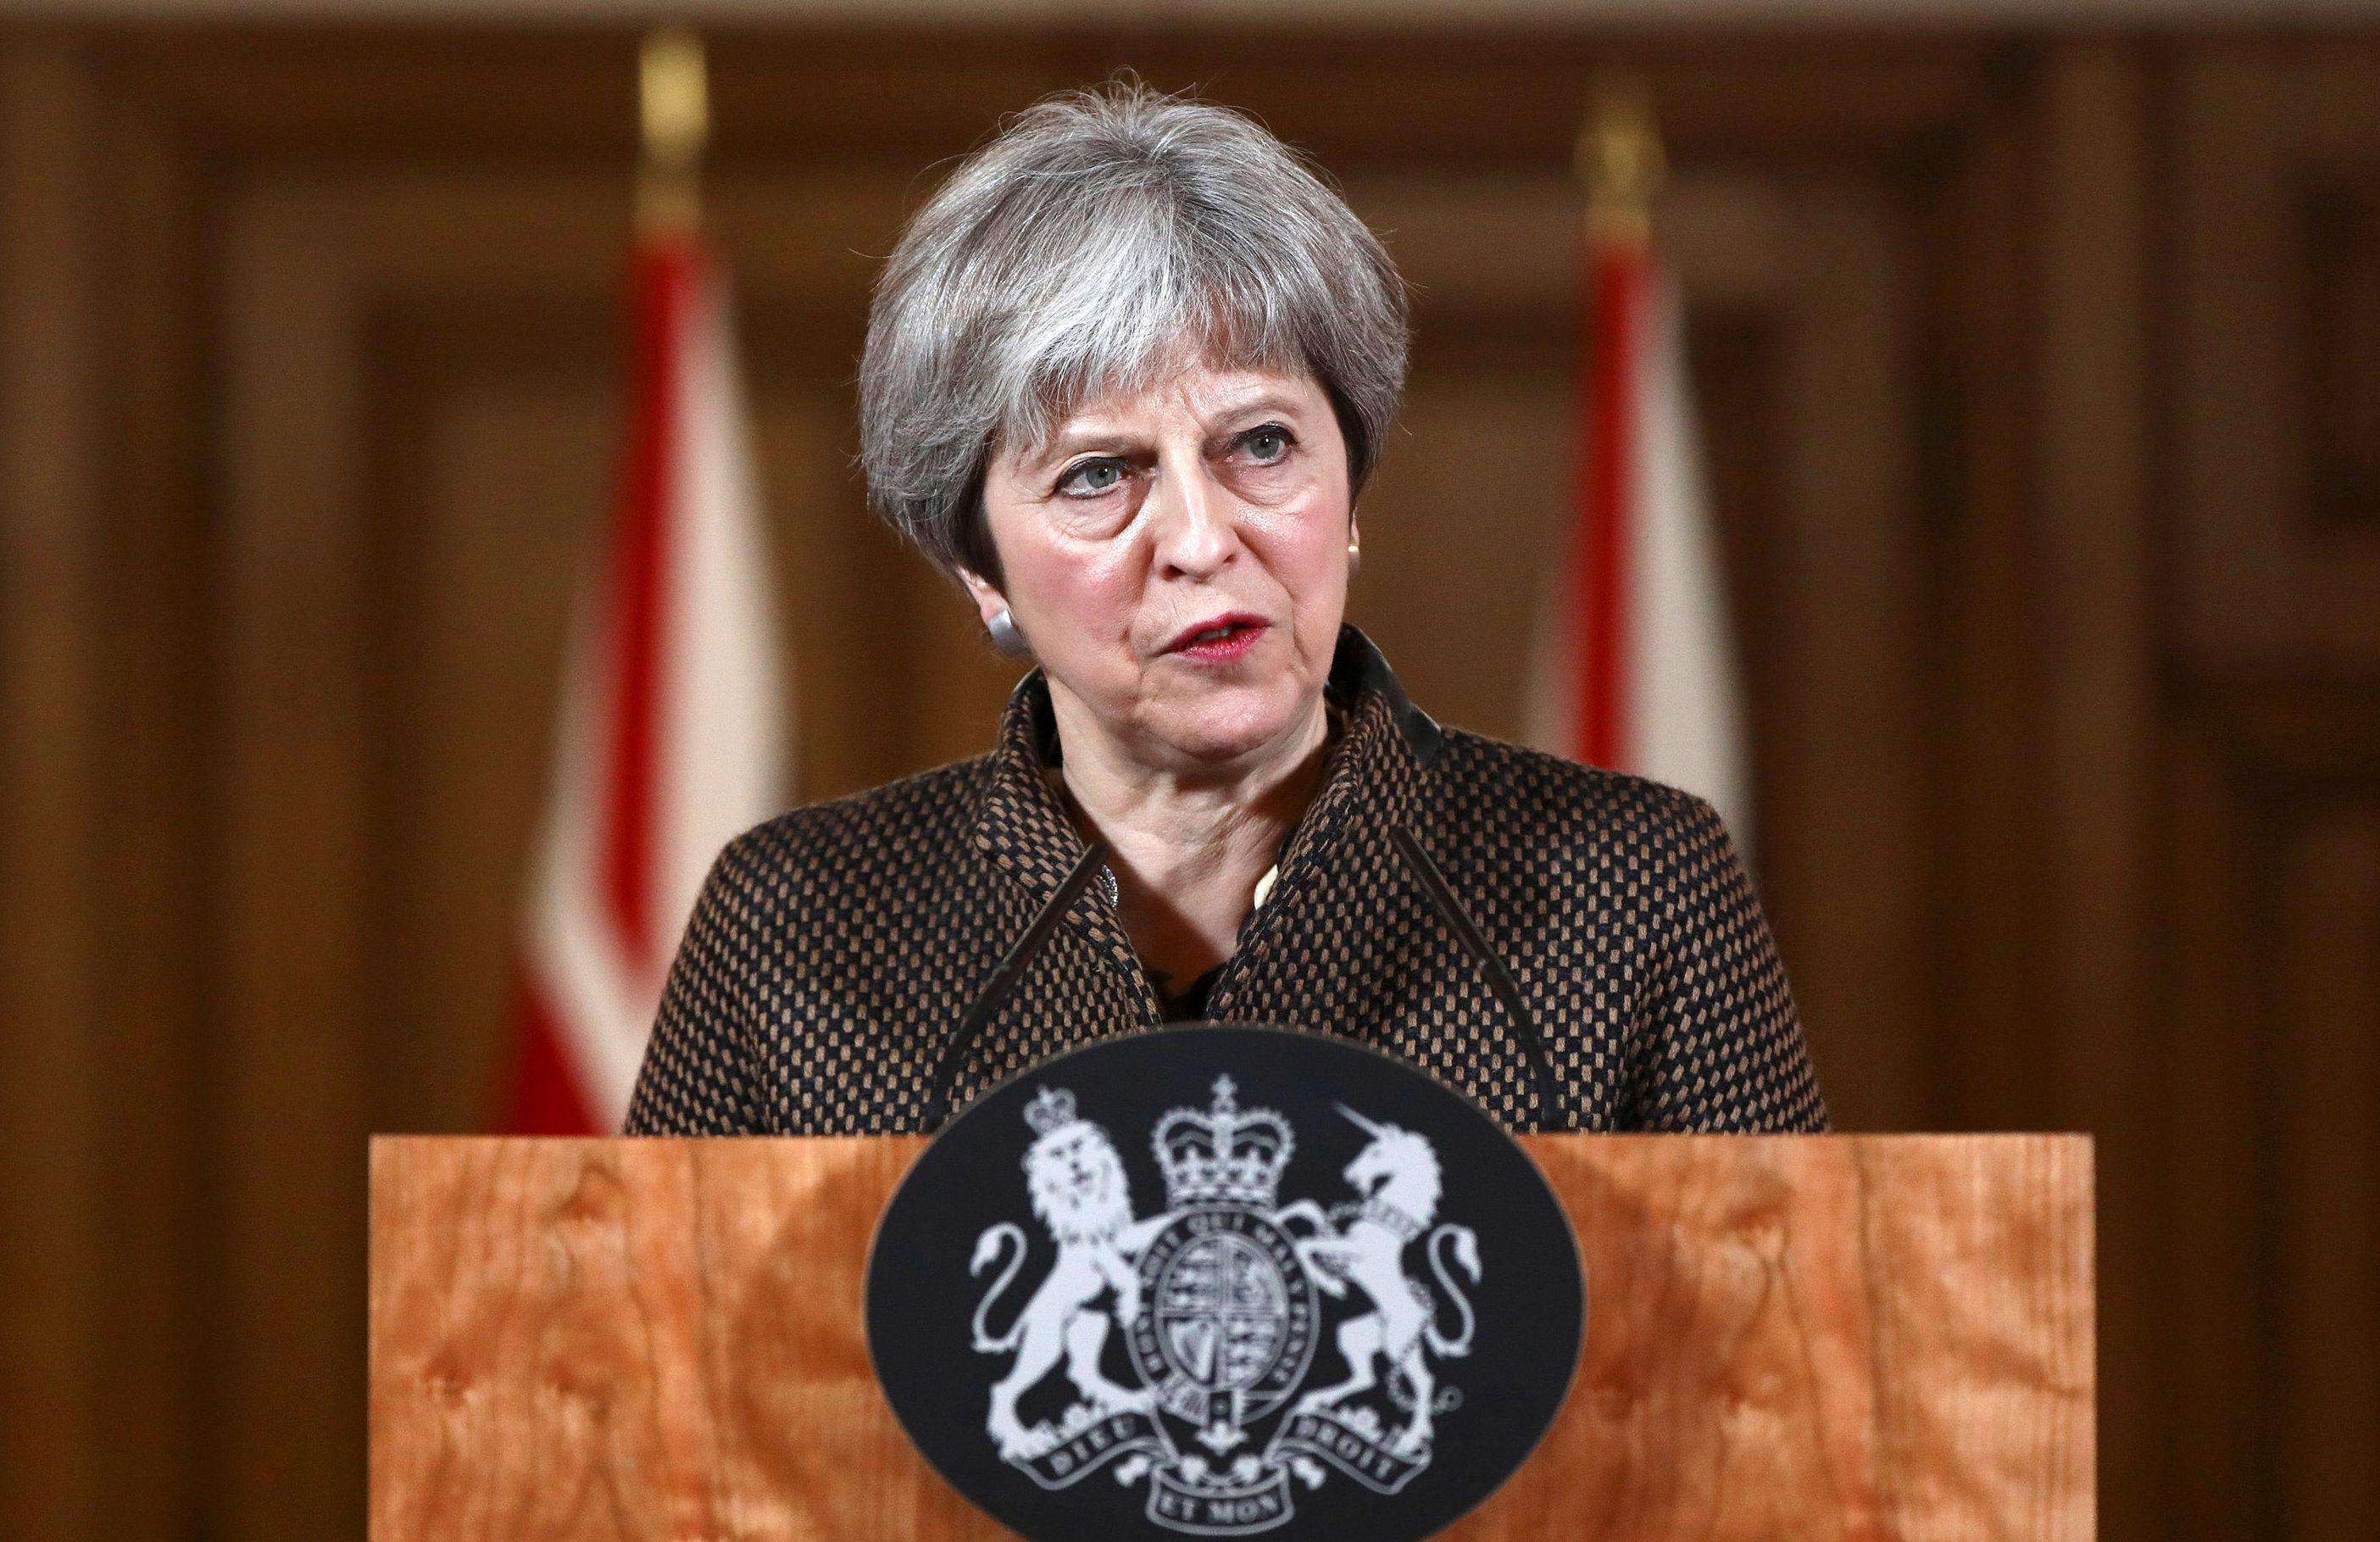 Prime Minister Theresa May (Simon Dawson/ WPA Pool/Getty Images)